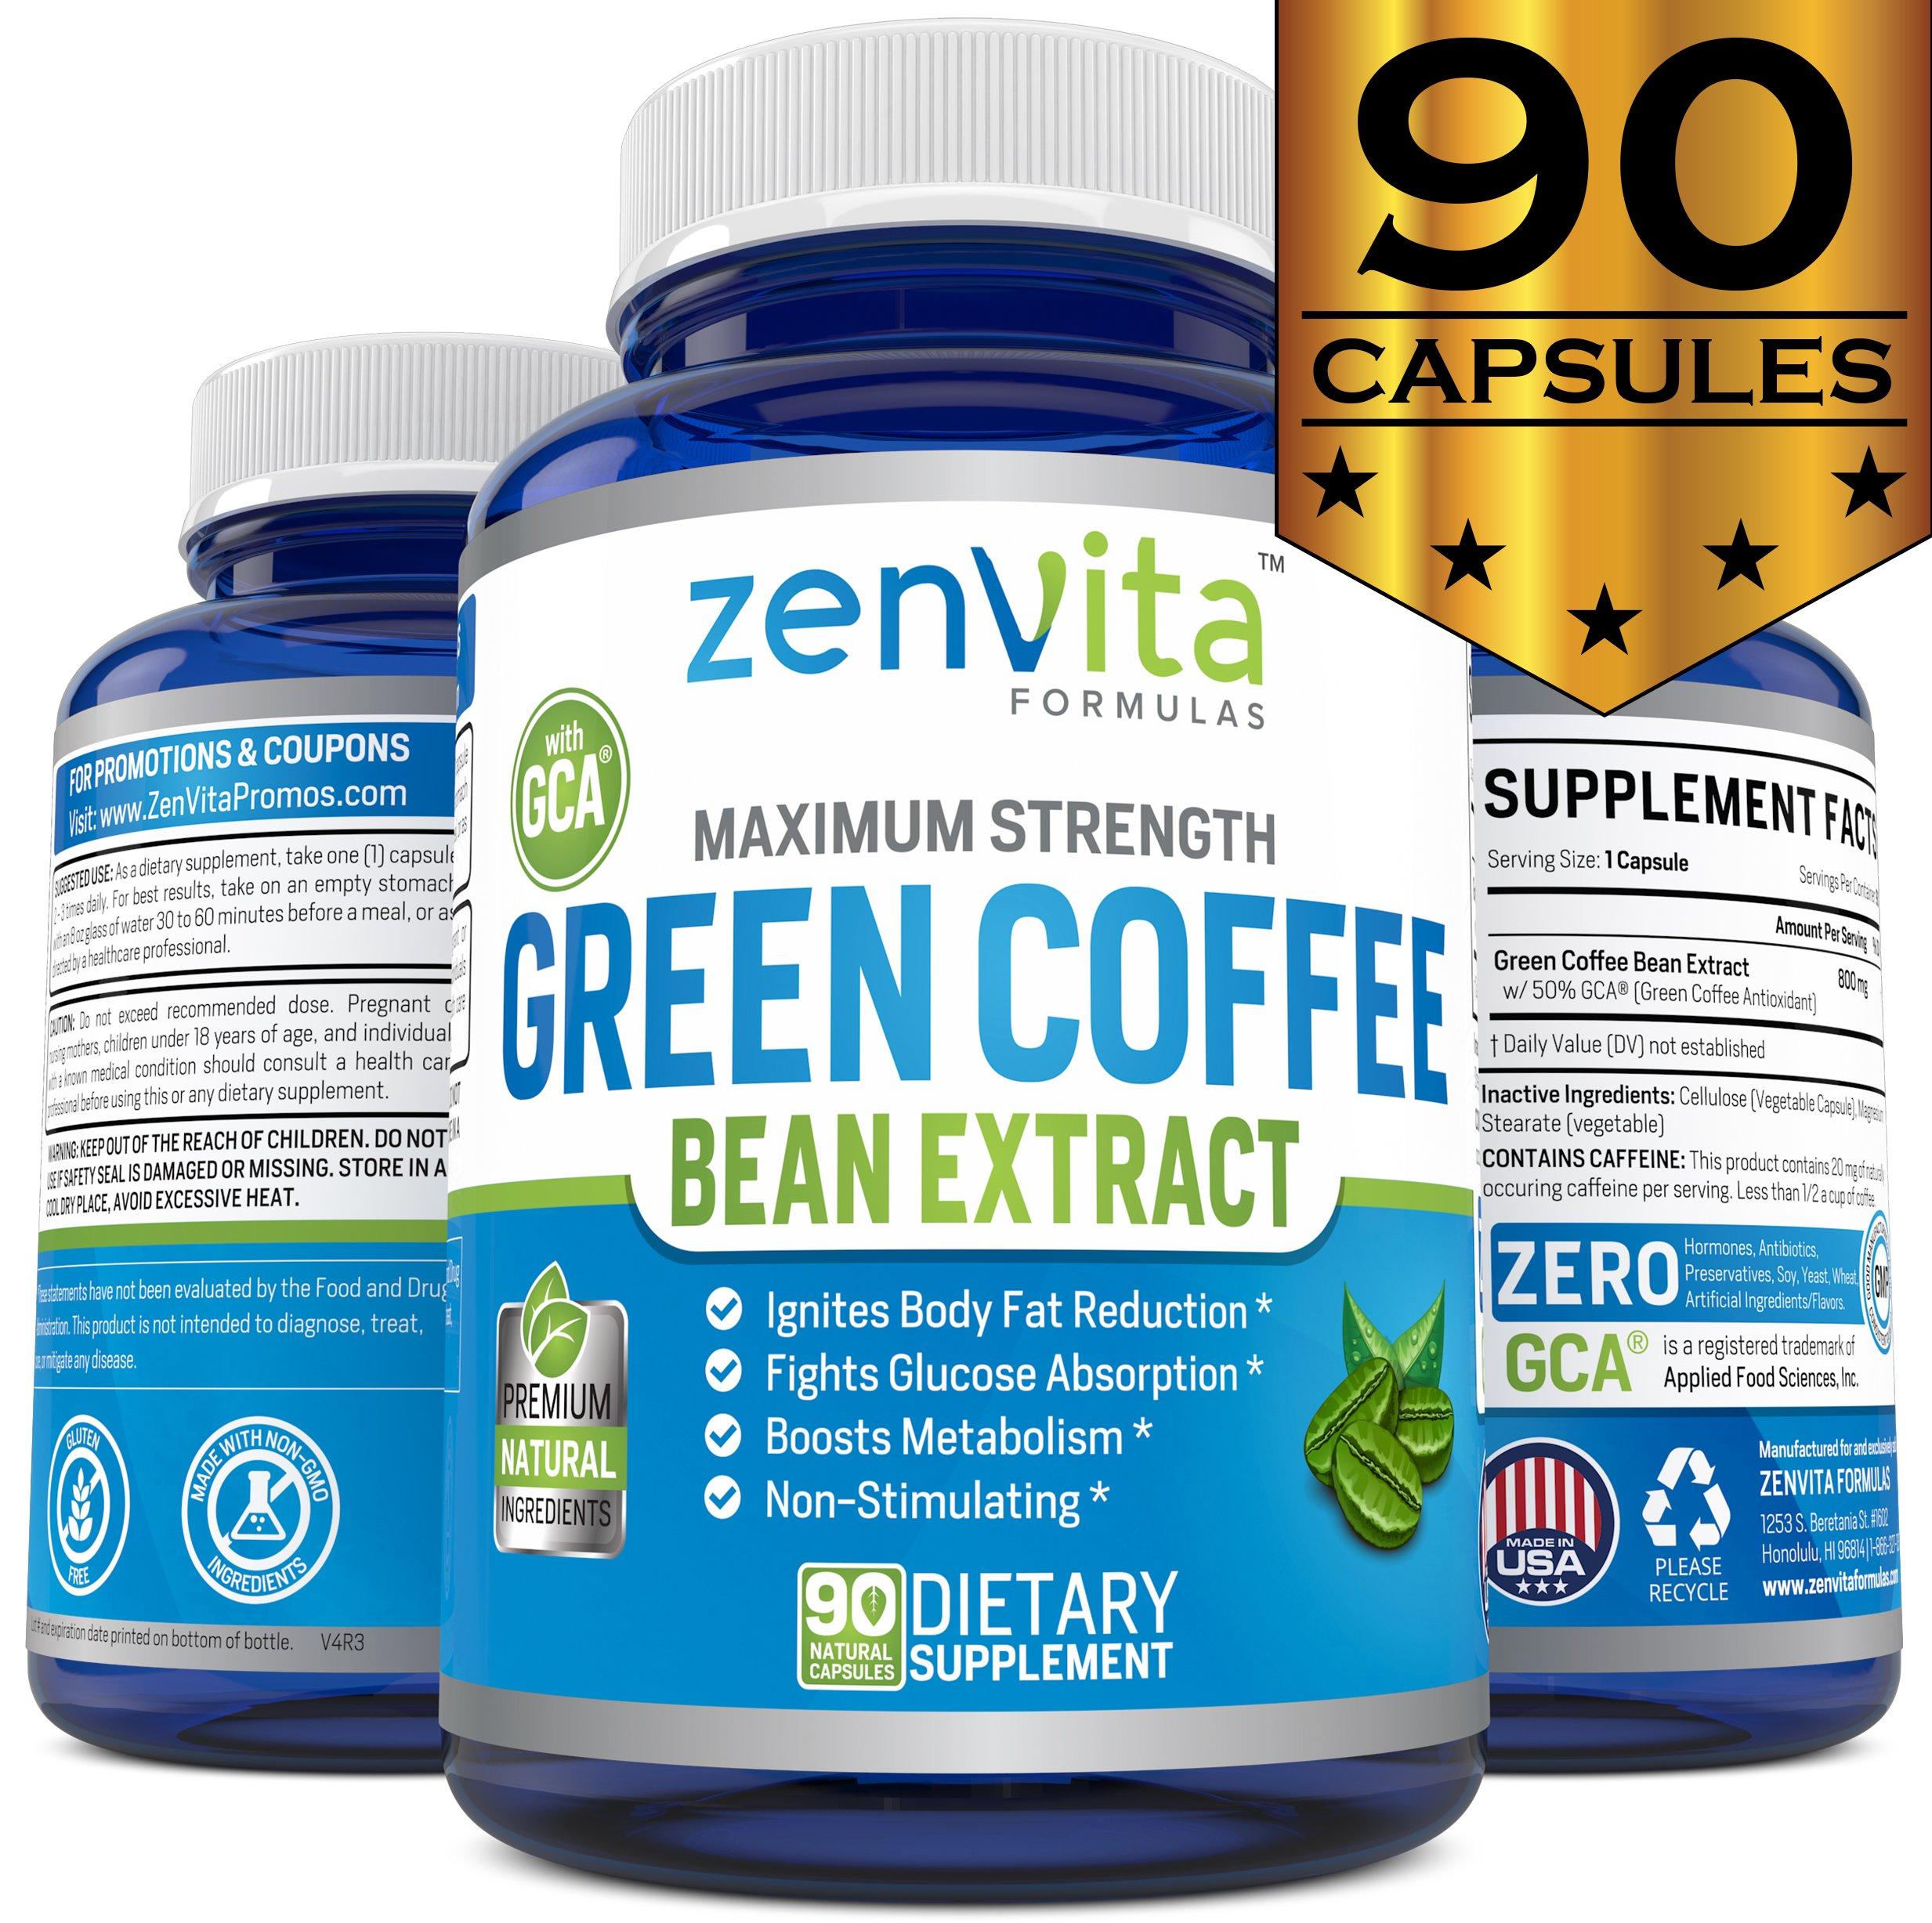 Pure Green Coffee Bean Extract - 90 Capsules, with GCA Green Coffee Antioxidant, Non-GMO & Gluten Free, Standardized 50% Chlorogenic Acid, Maximum Strength Green Coffee Bean Extract for Weight Loss by ZenVita Formulas